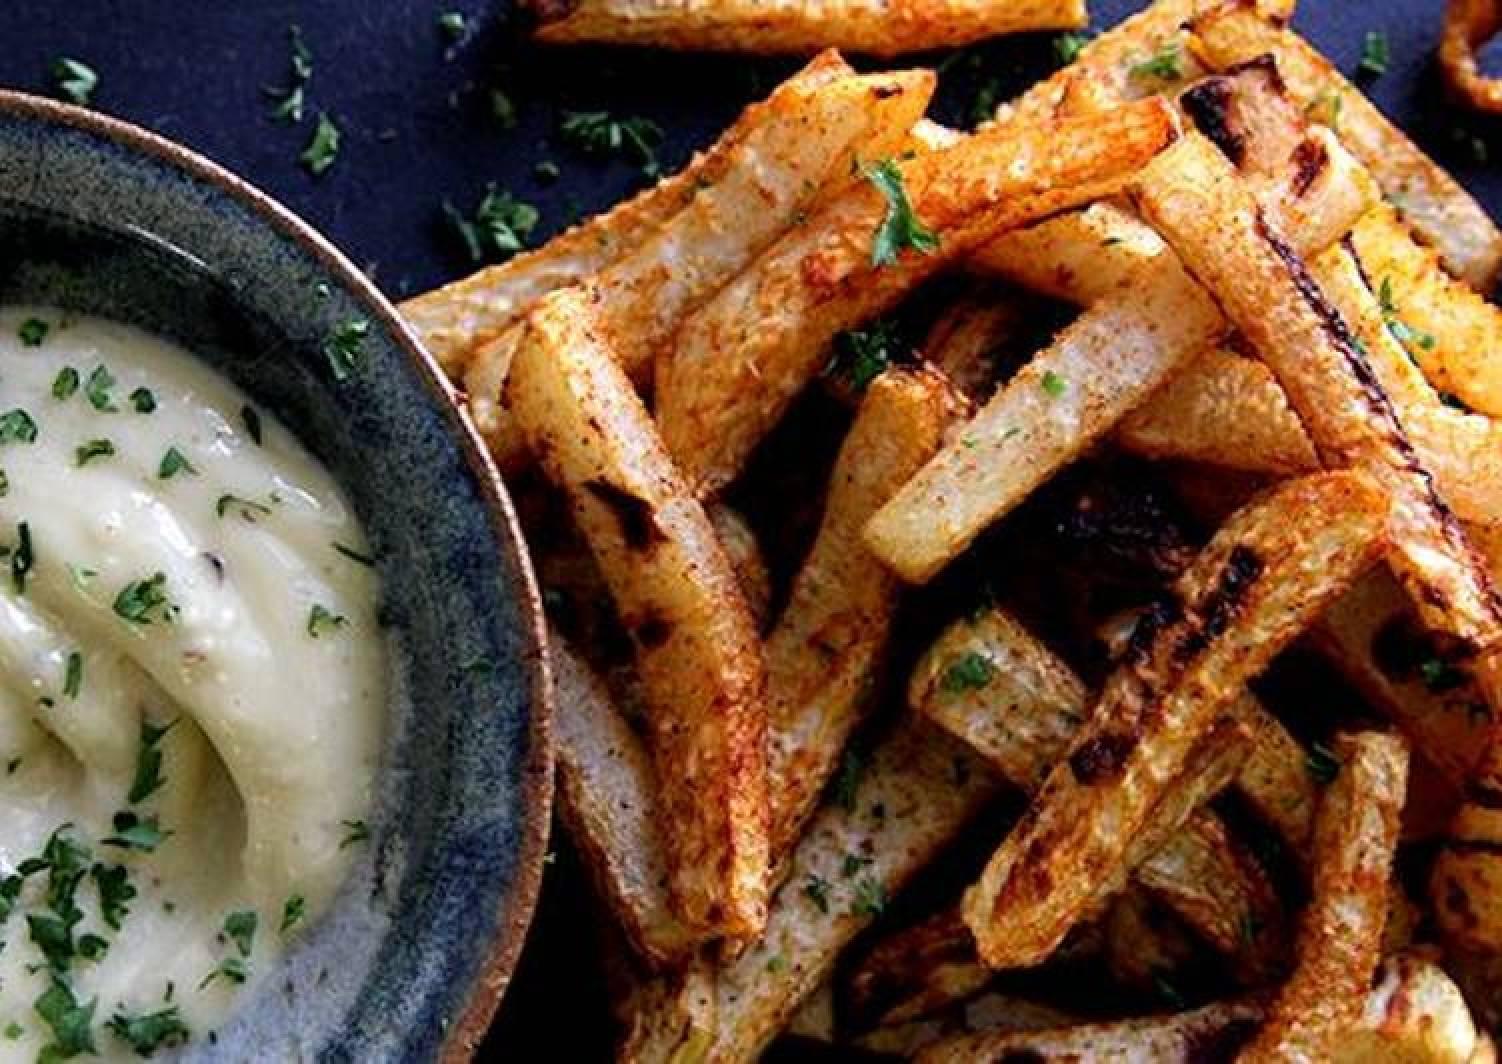 Kohlrabi Fries with Garlic Aioli